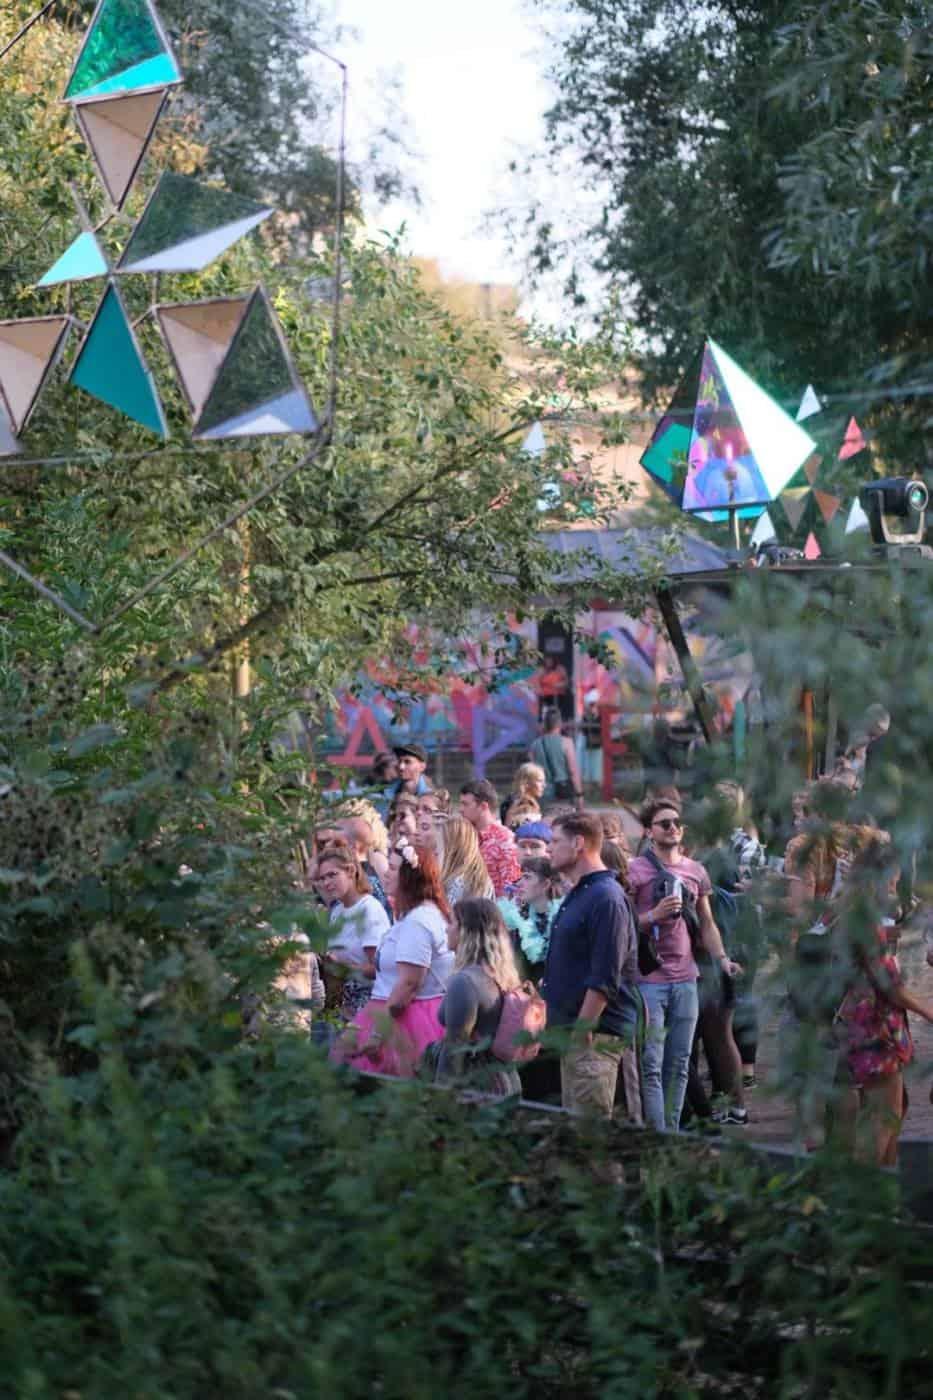 Vogelball festival in Hamburg Germany